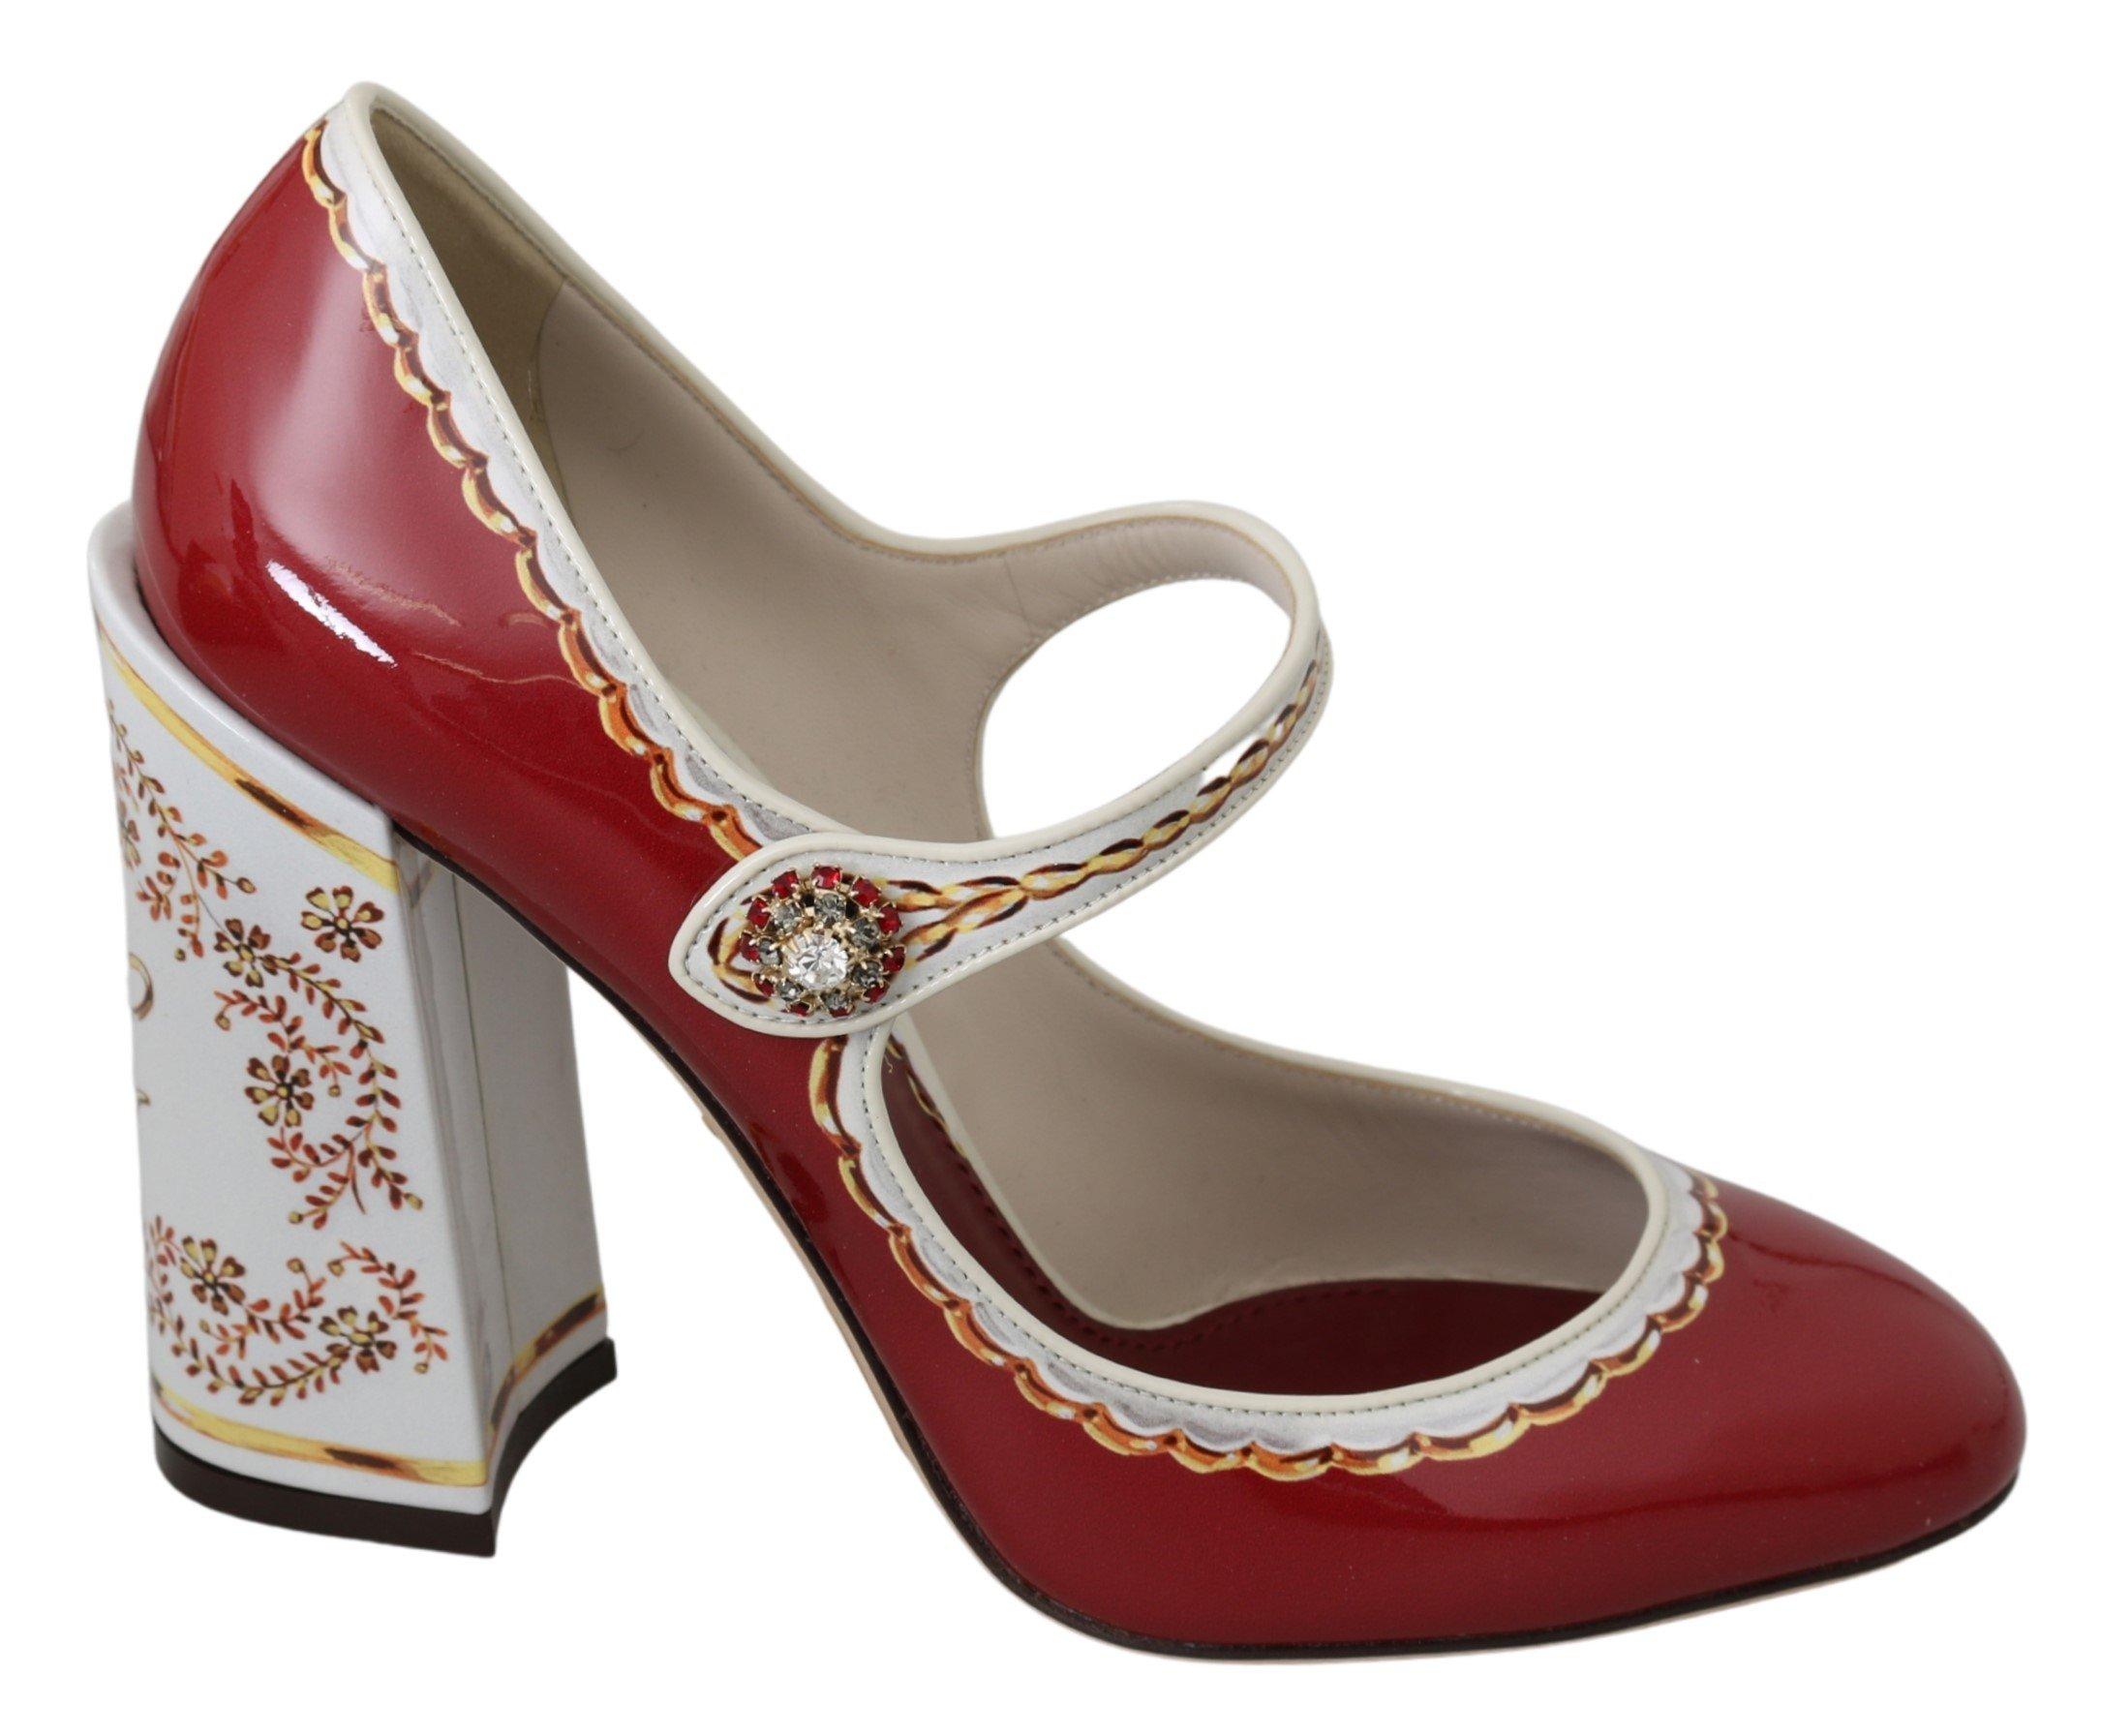 Dolce & Gabbana Women's Leather Mary Jane Pumps Red LA6922 - EU39/US8.5